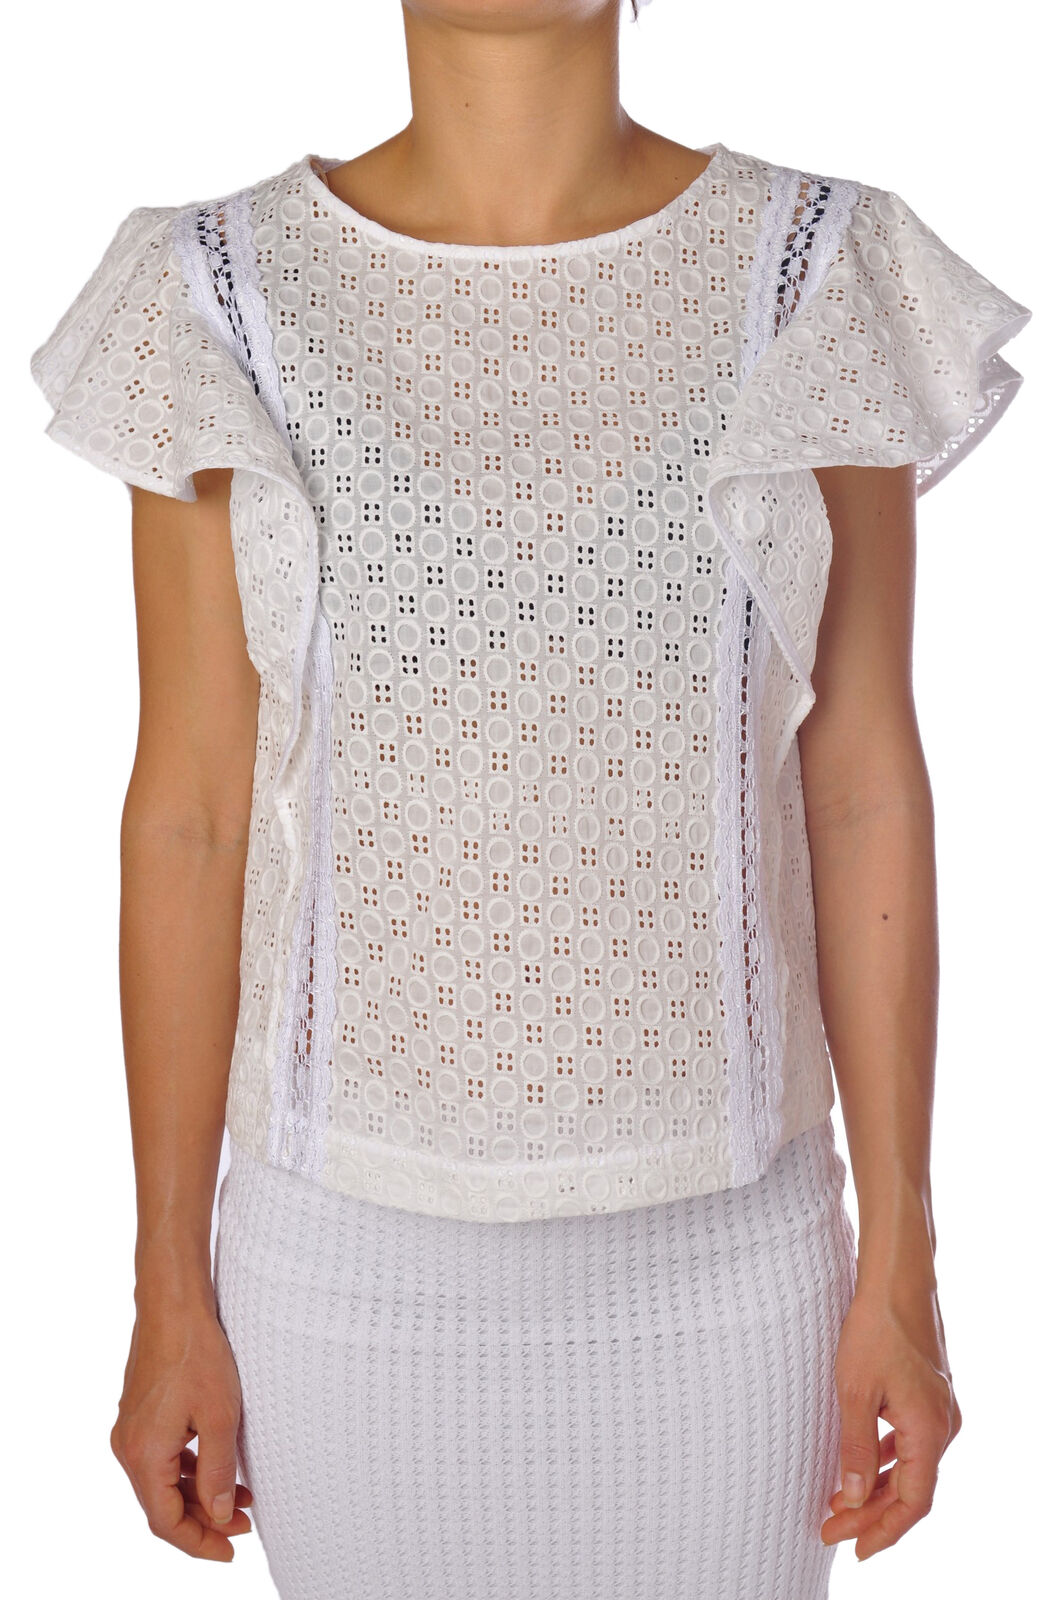 Pinko - Shirts-Blouses - woman - bluee - 803018C184746